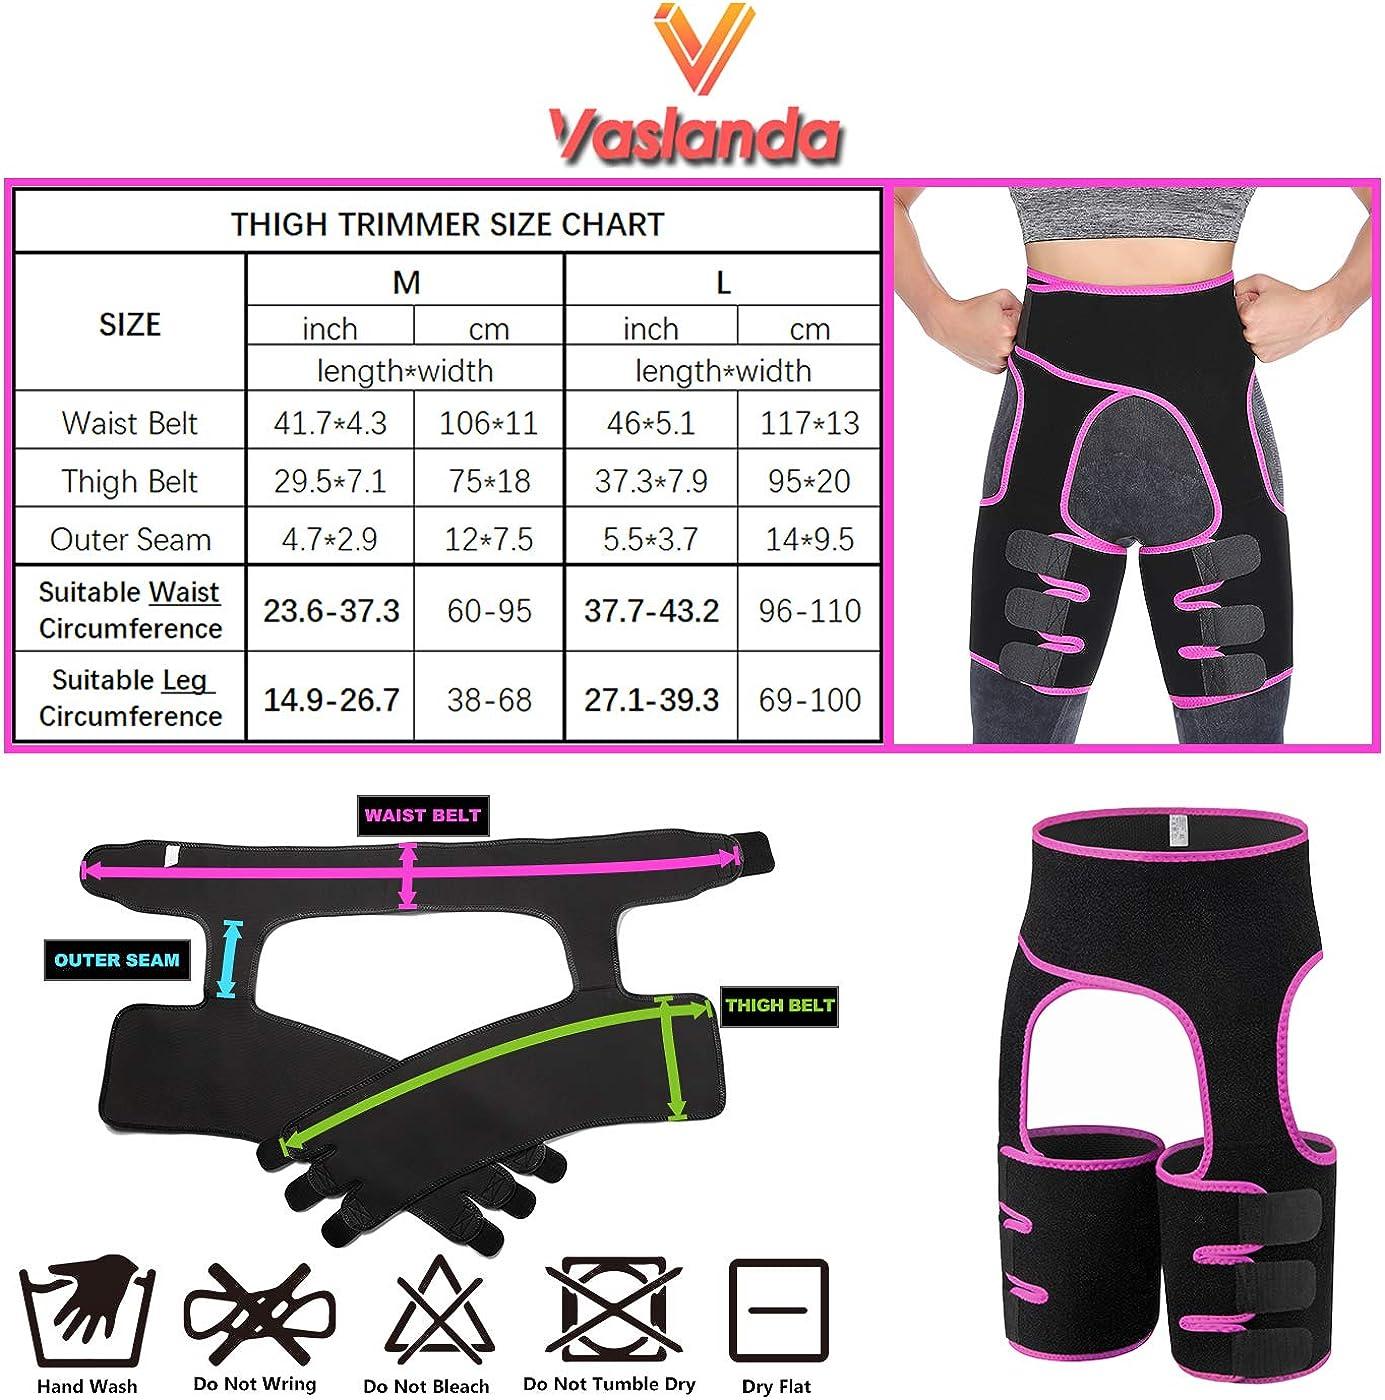 Vaslanda 2 in 1 Waist Trainer Thigh Trimmer Butt Lifter Workout Belt Neoprene Squat Training Hip Shaping Thigh Slimmer Shaper